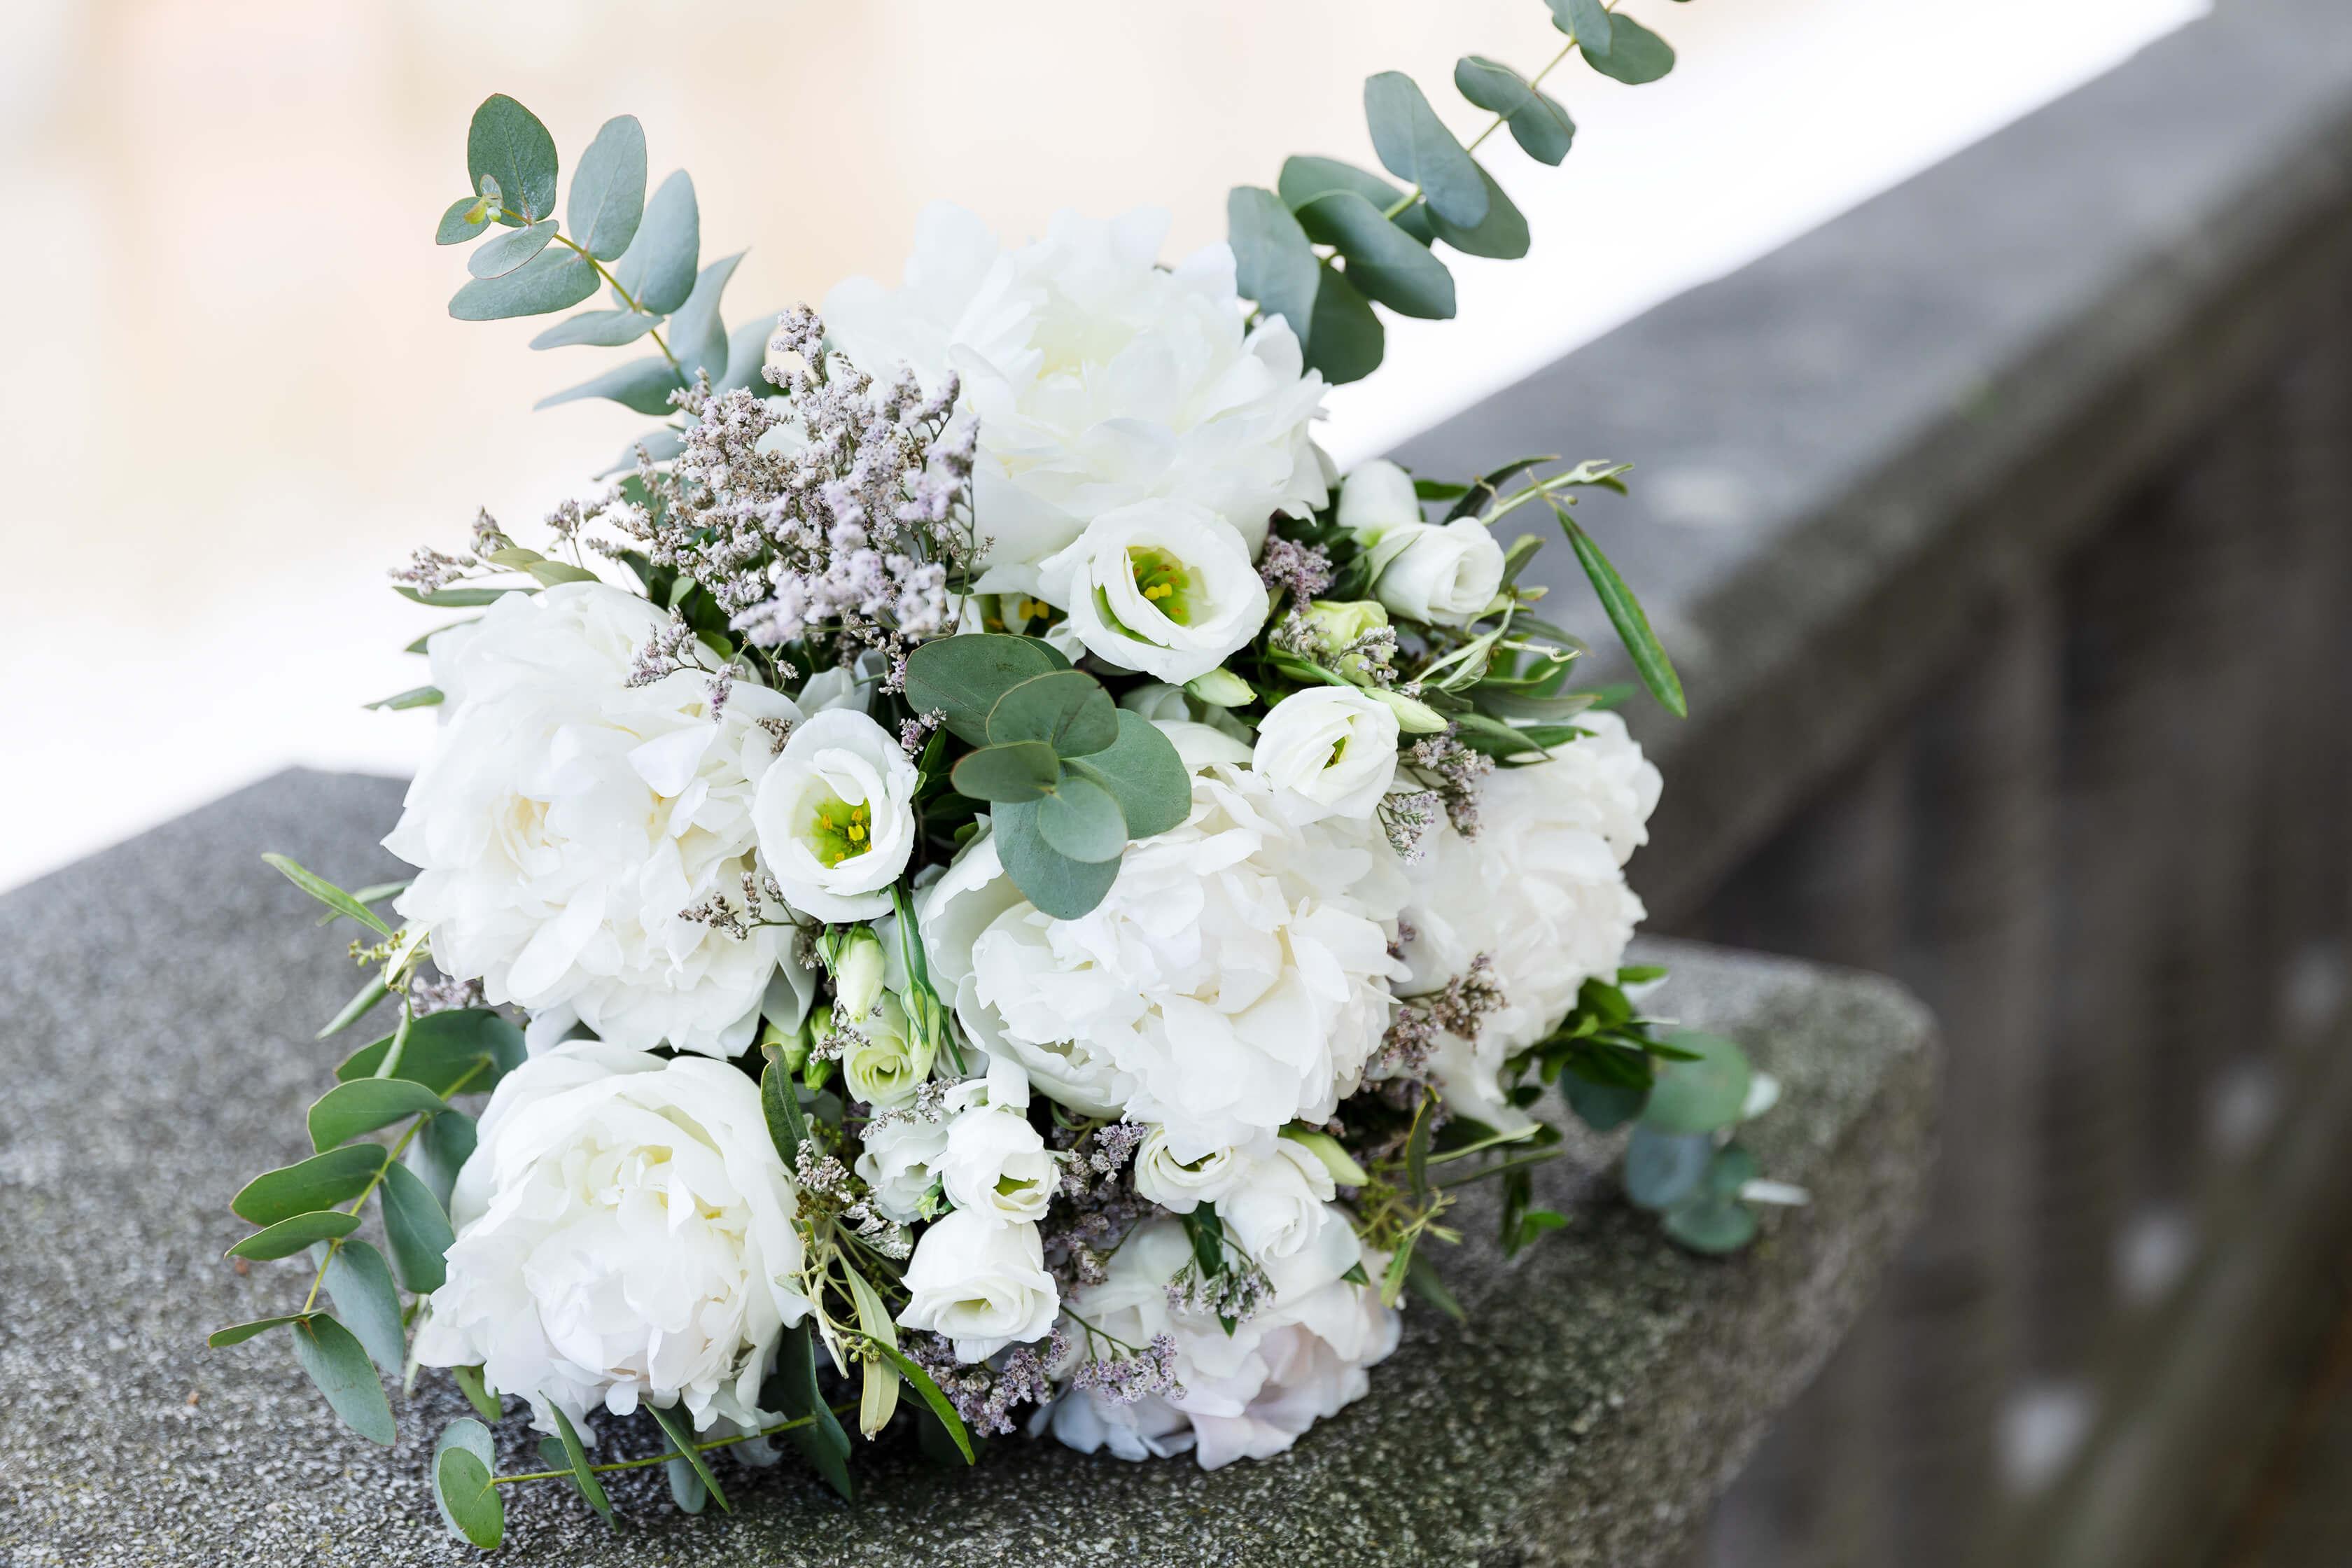 mont blanc ramo de peonias blancas de colvin